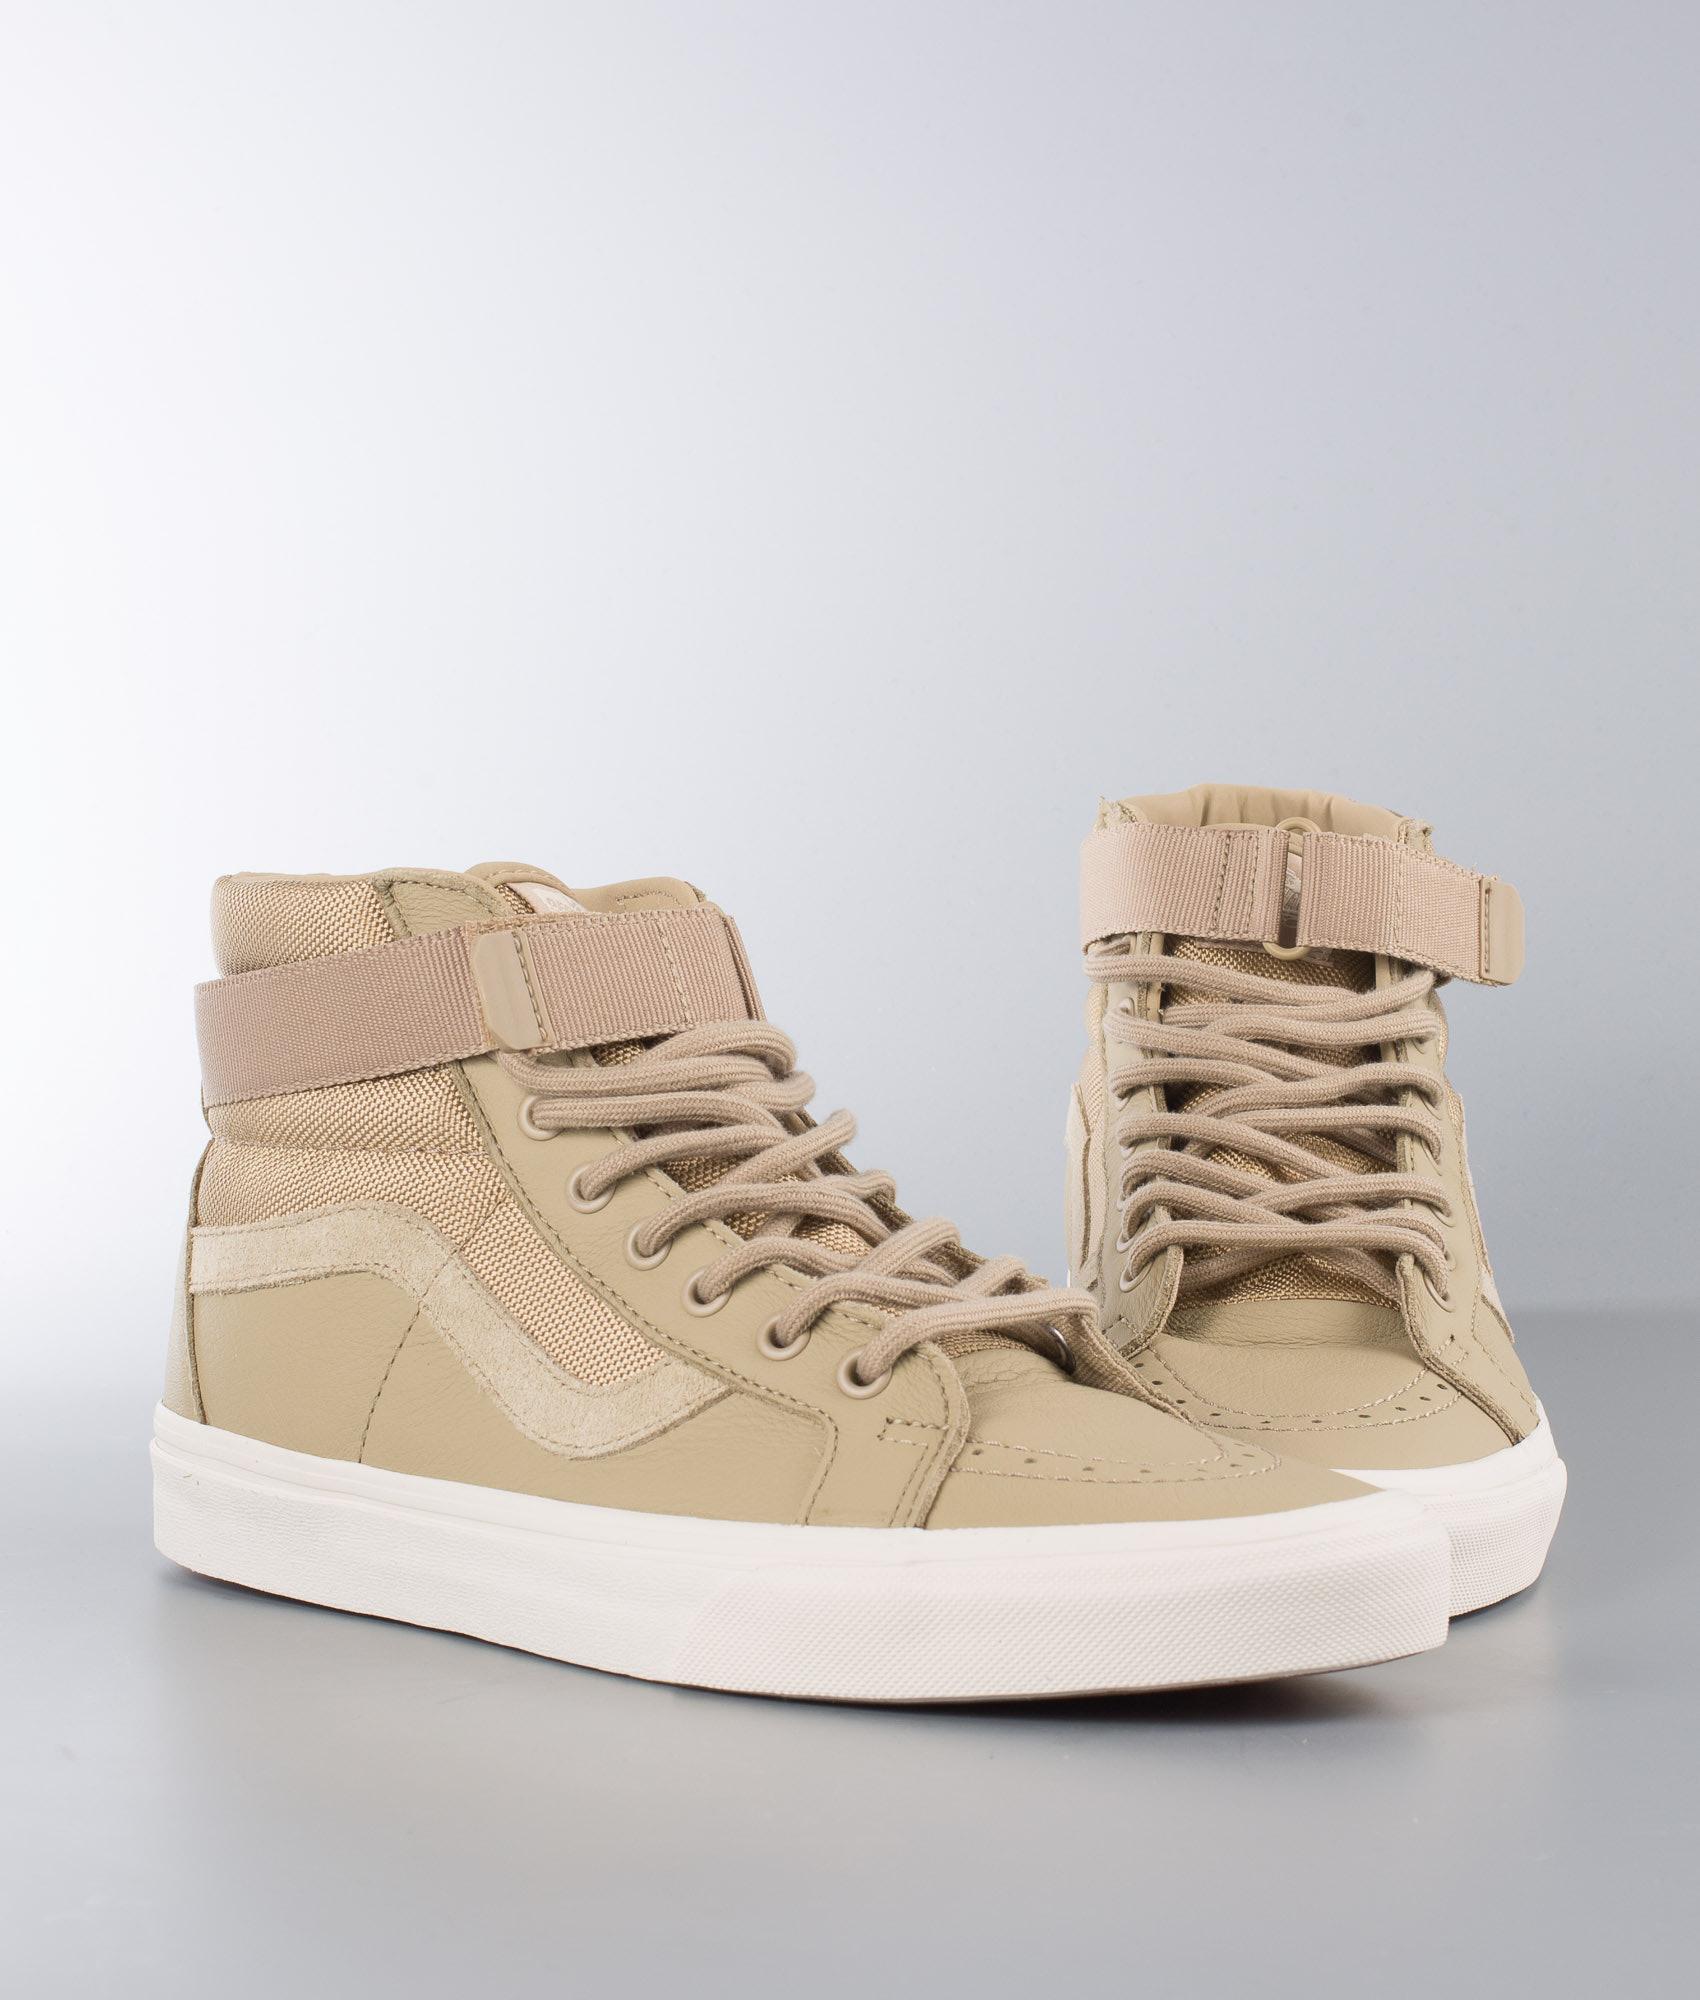 07539a1dc571b0 Vans Sk8-Hi Reissue Strap Schuhe (Leather) Ballistic Cornstalk ...